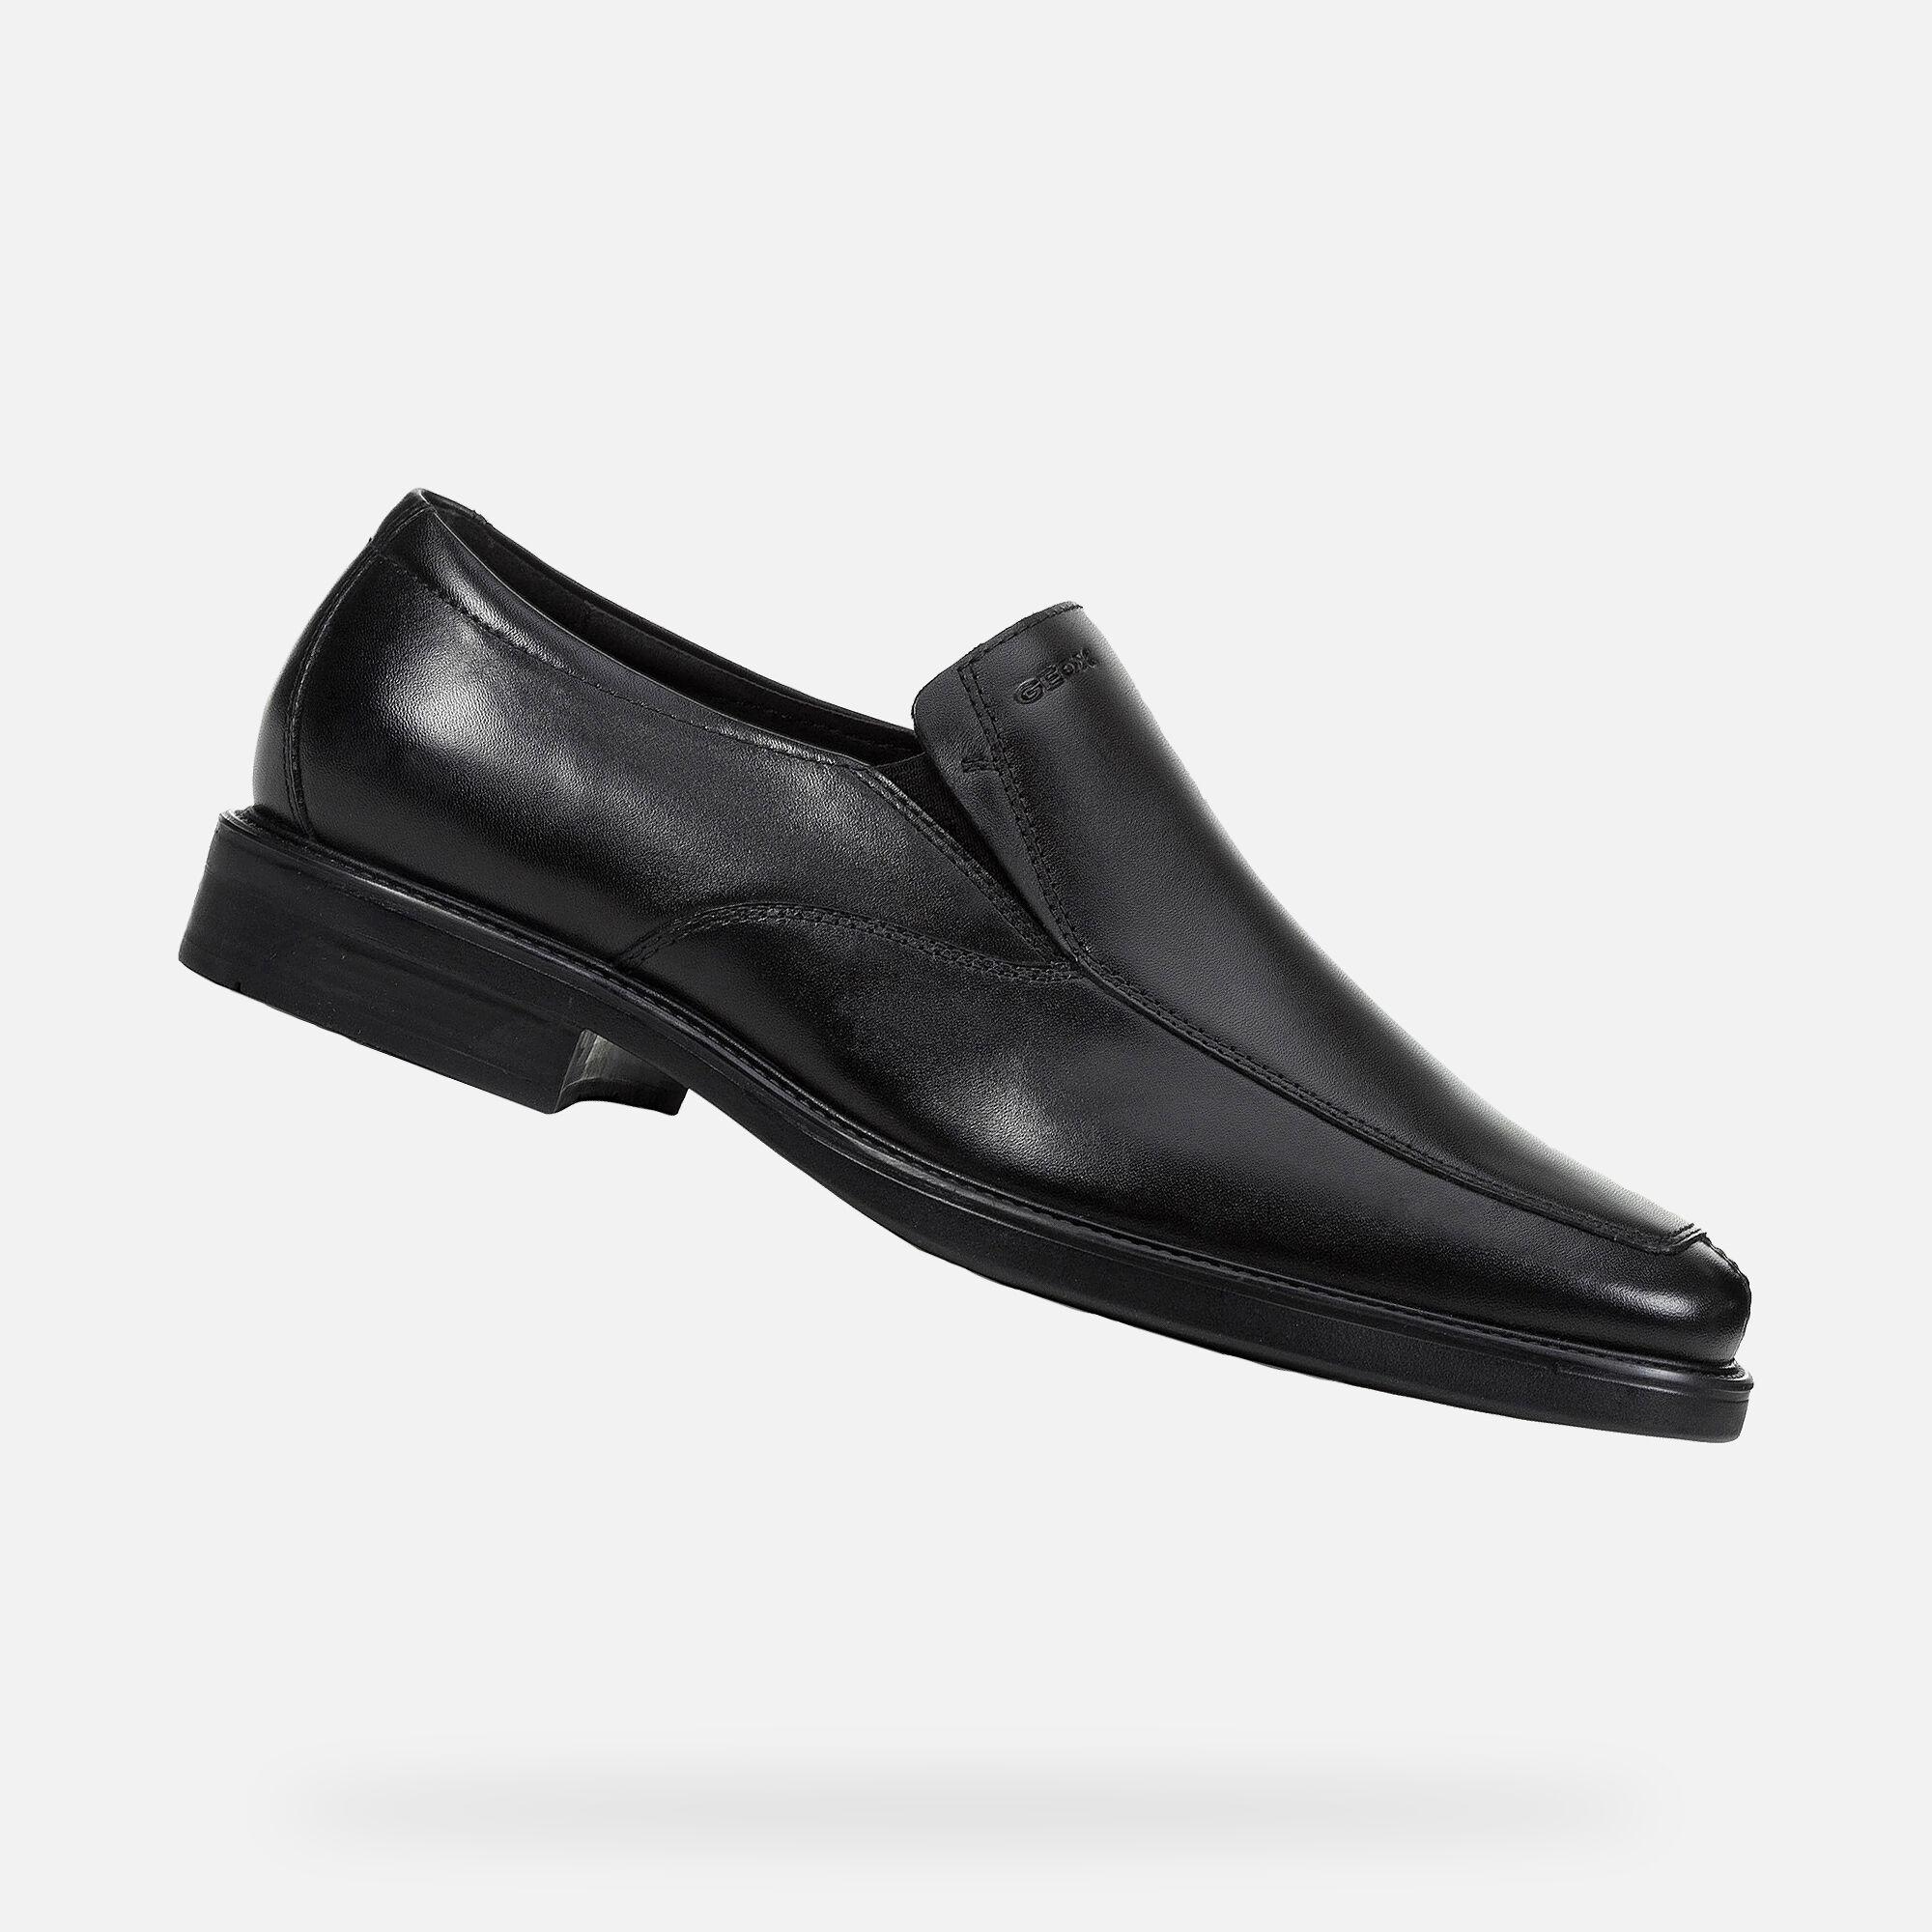 GEOX Brandolf Men's Slipper Black Shoes